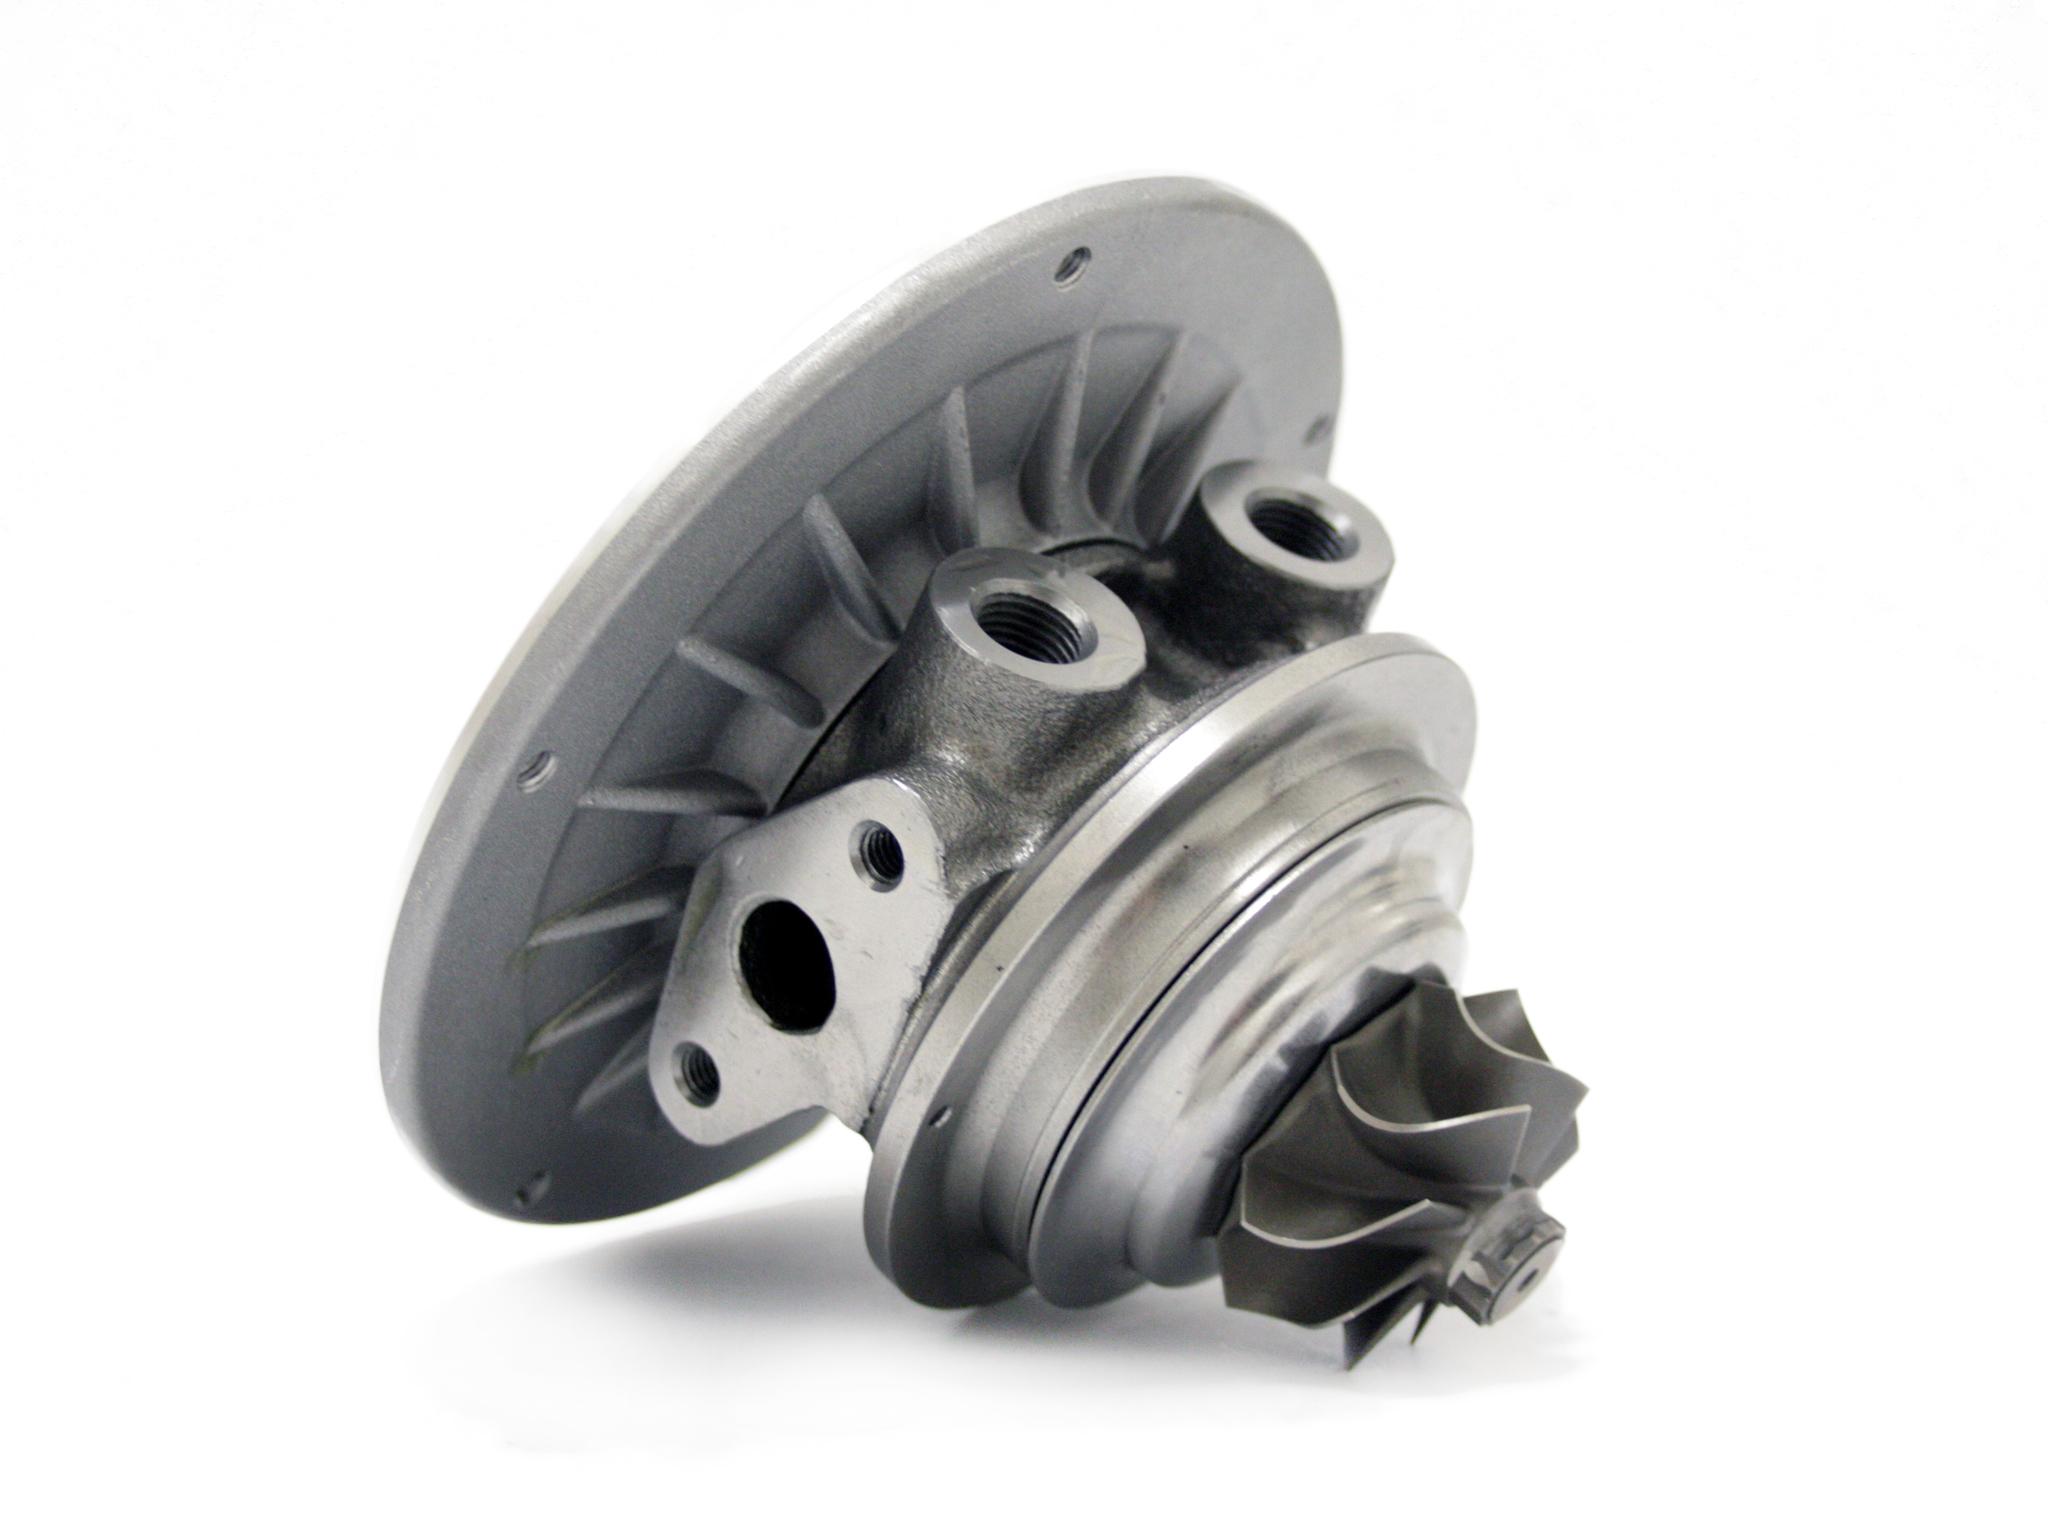 Картридж турбины RHF5 Исузу 2.8 / 3.1 4JX1-T, 4JG2-T, 4JB1-T 115 / 159 л.с.